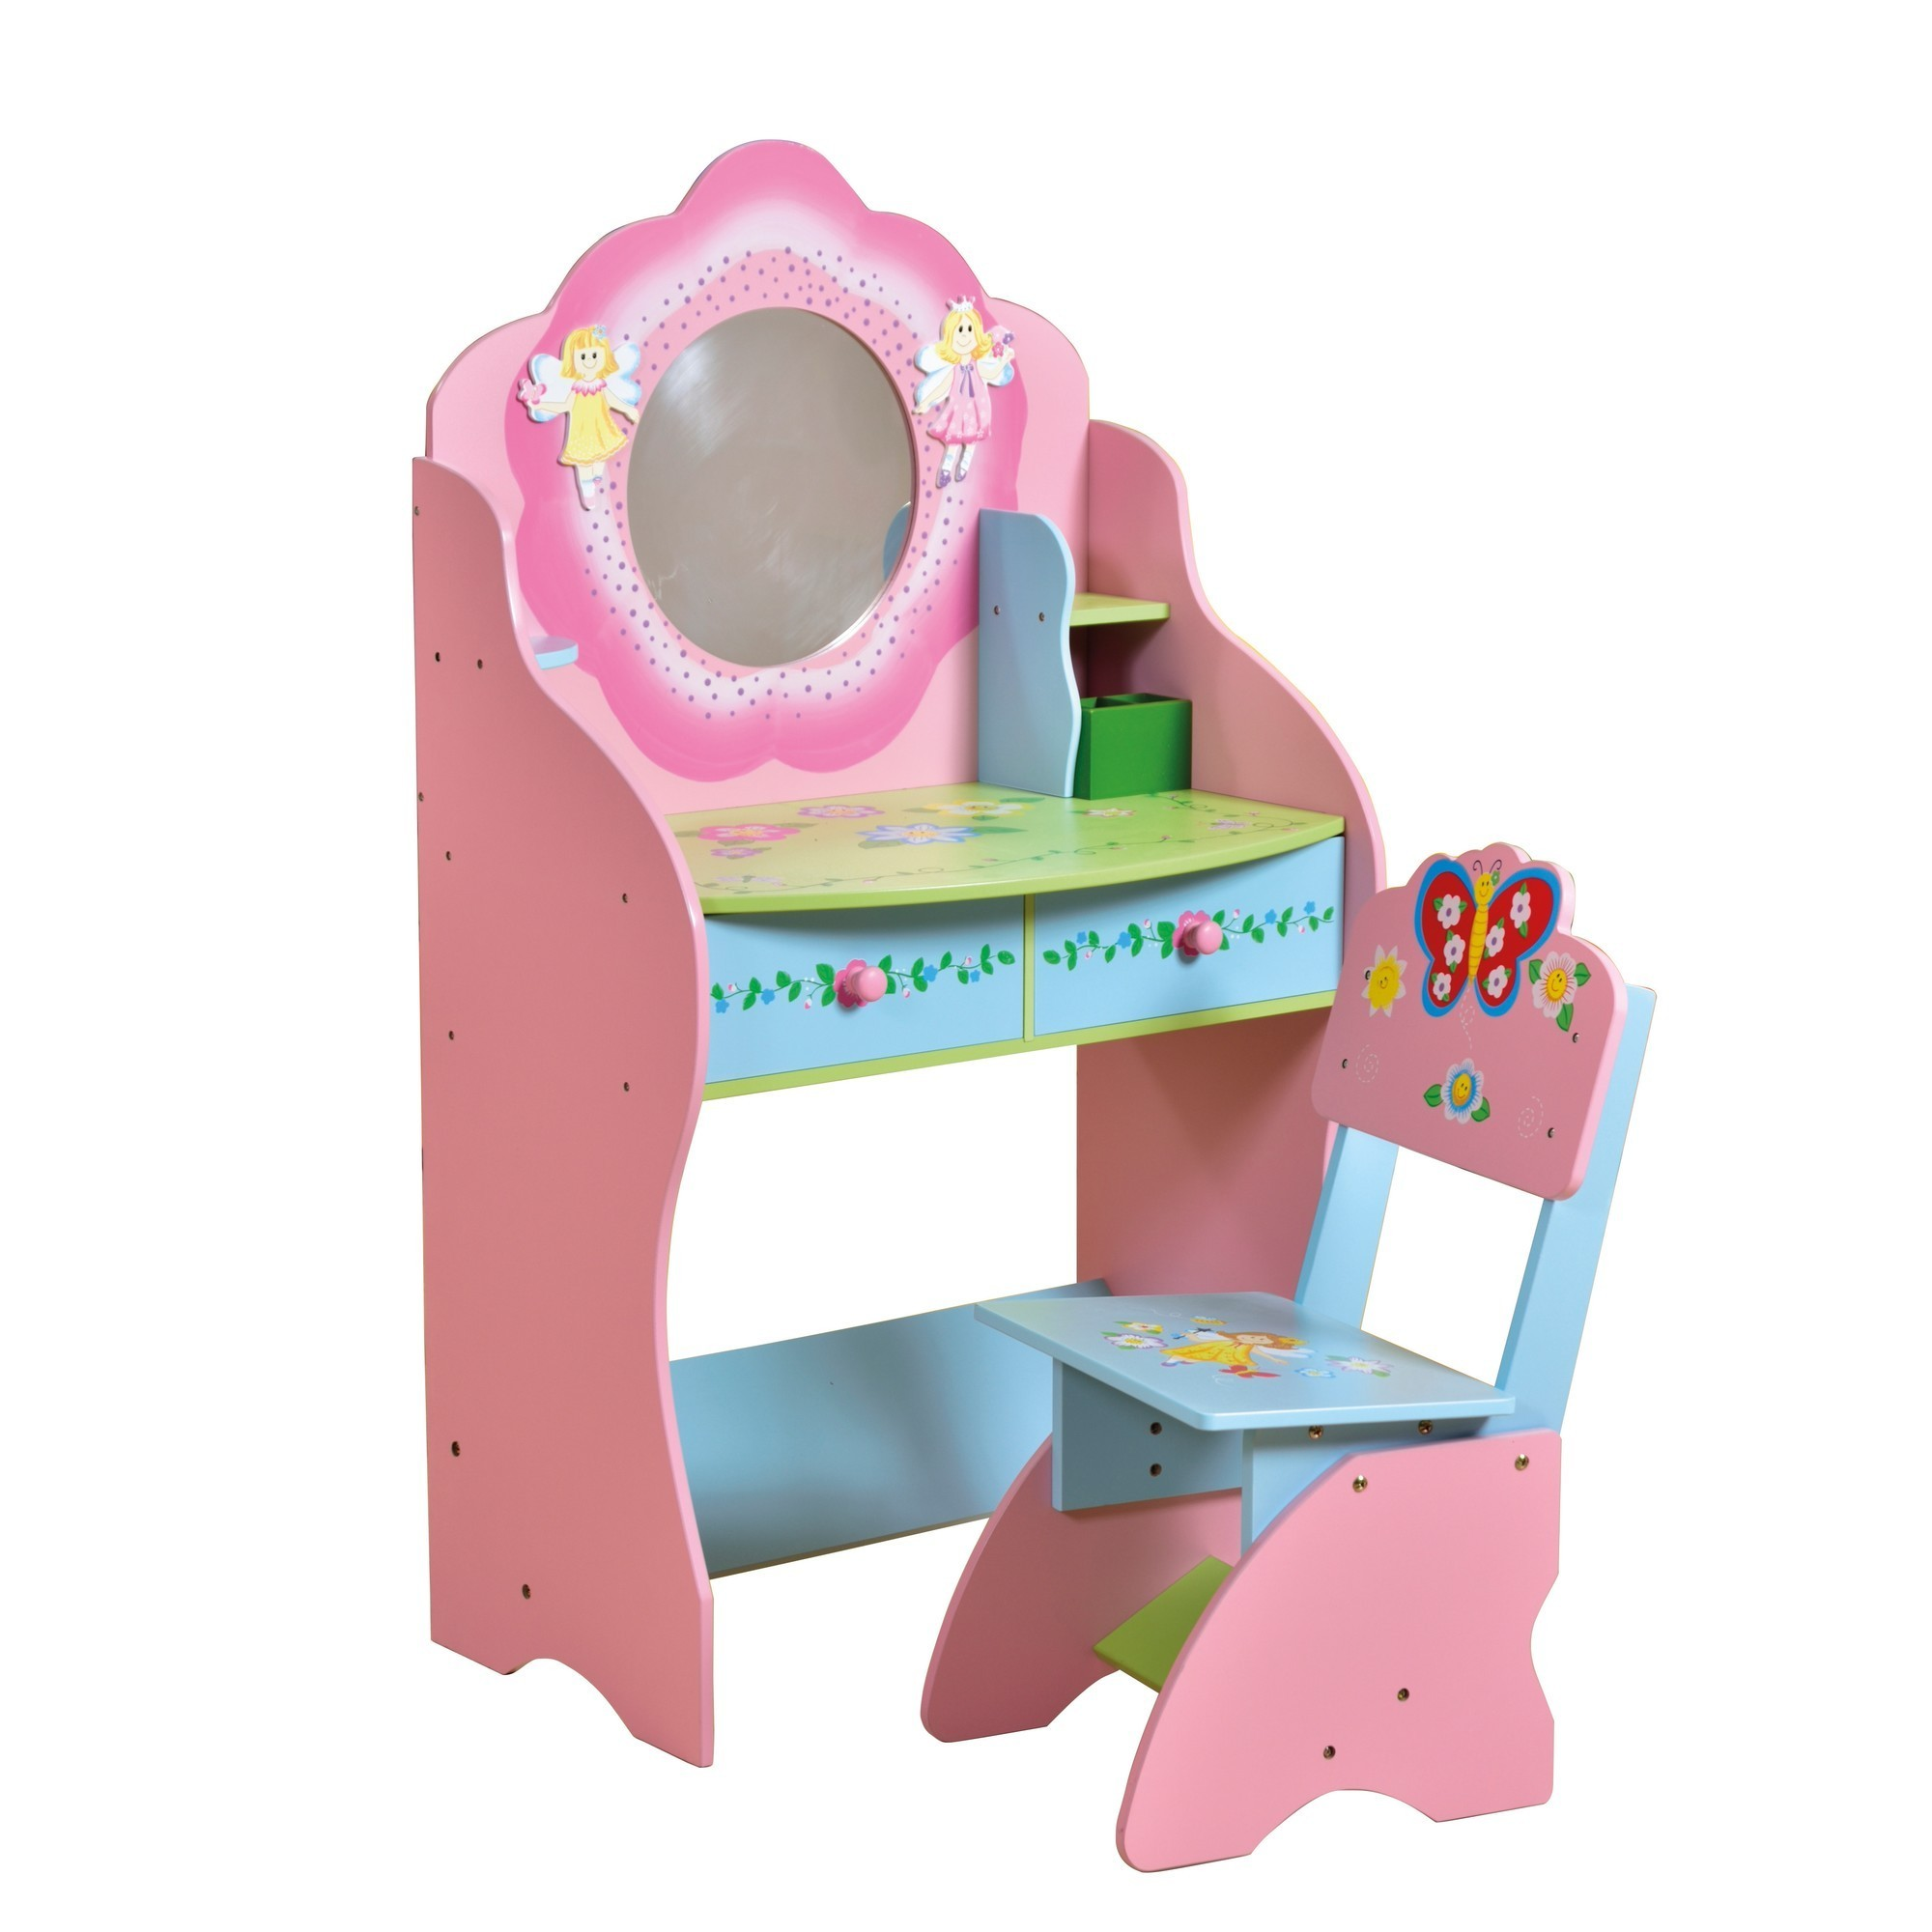 Fairy Schminktisch Stuhl Lht10043 Per Sempre Toys